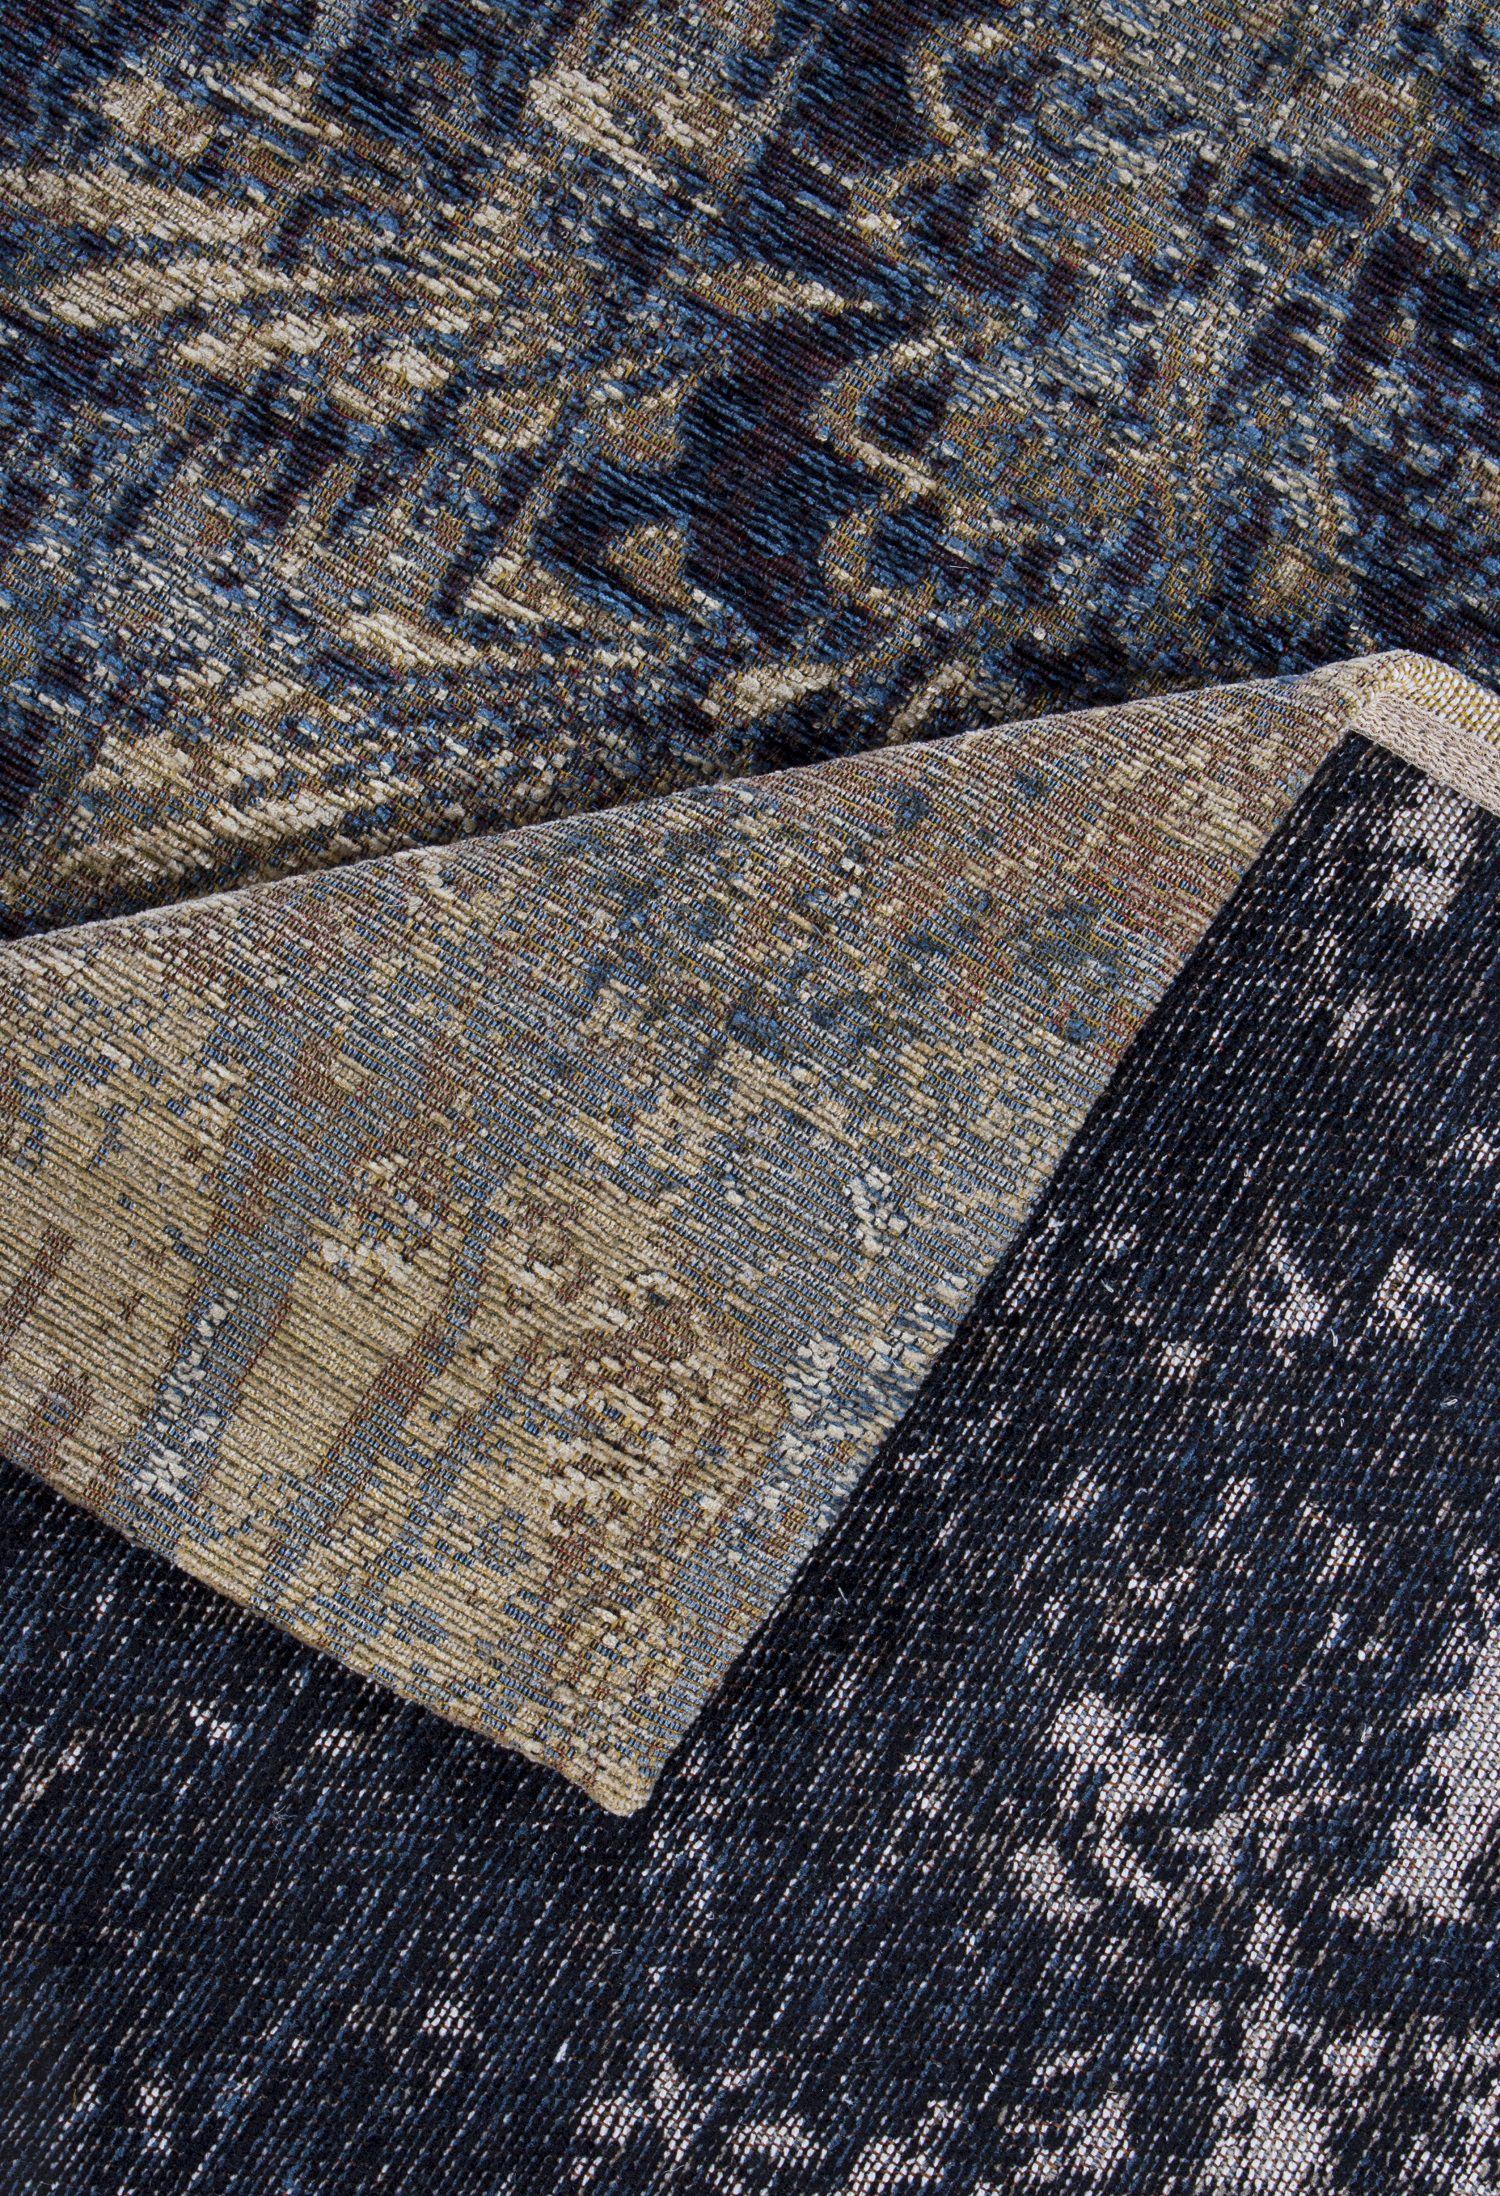 teppich luxor living antique beige blau raum quadrat fashion your room der onlineshop f r. Black Bedroom Furniture Sets. Home Design Ideas